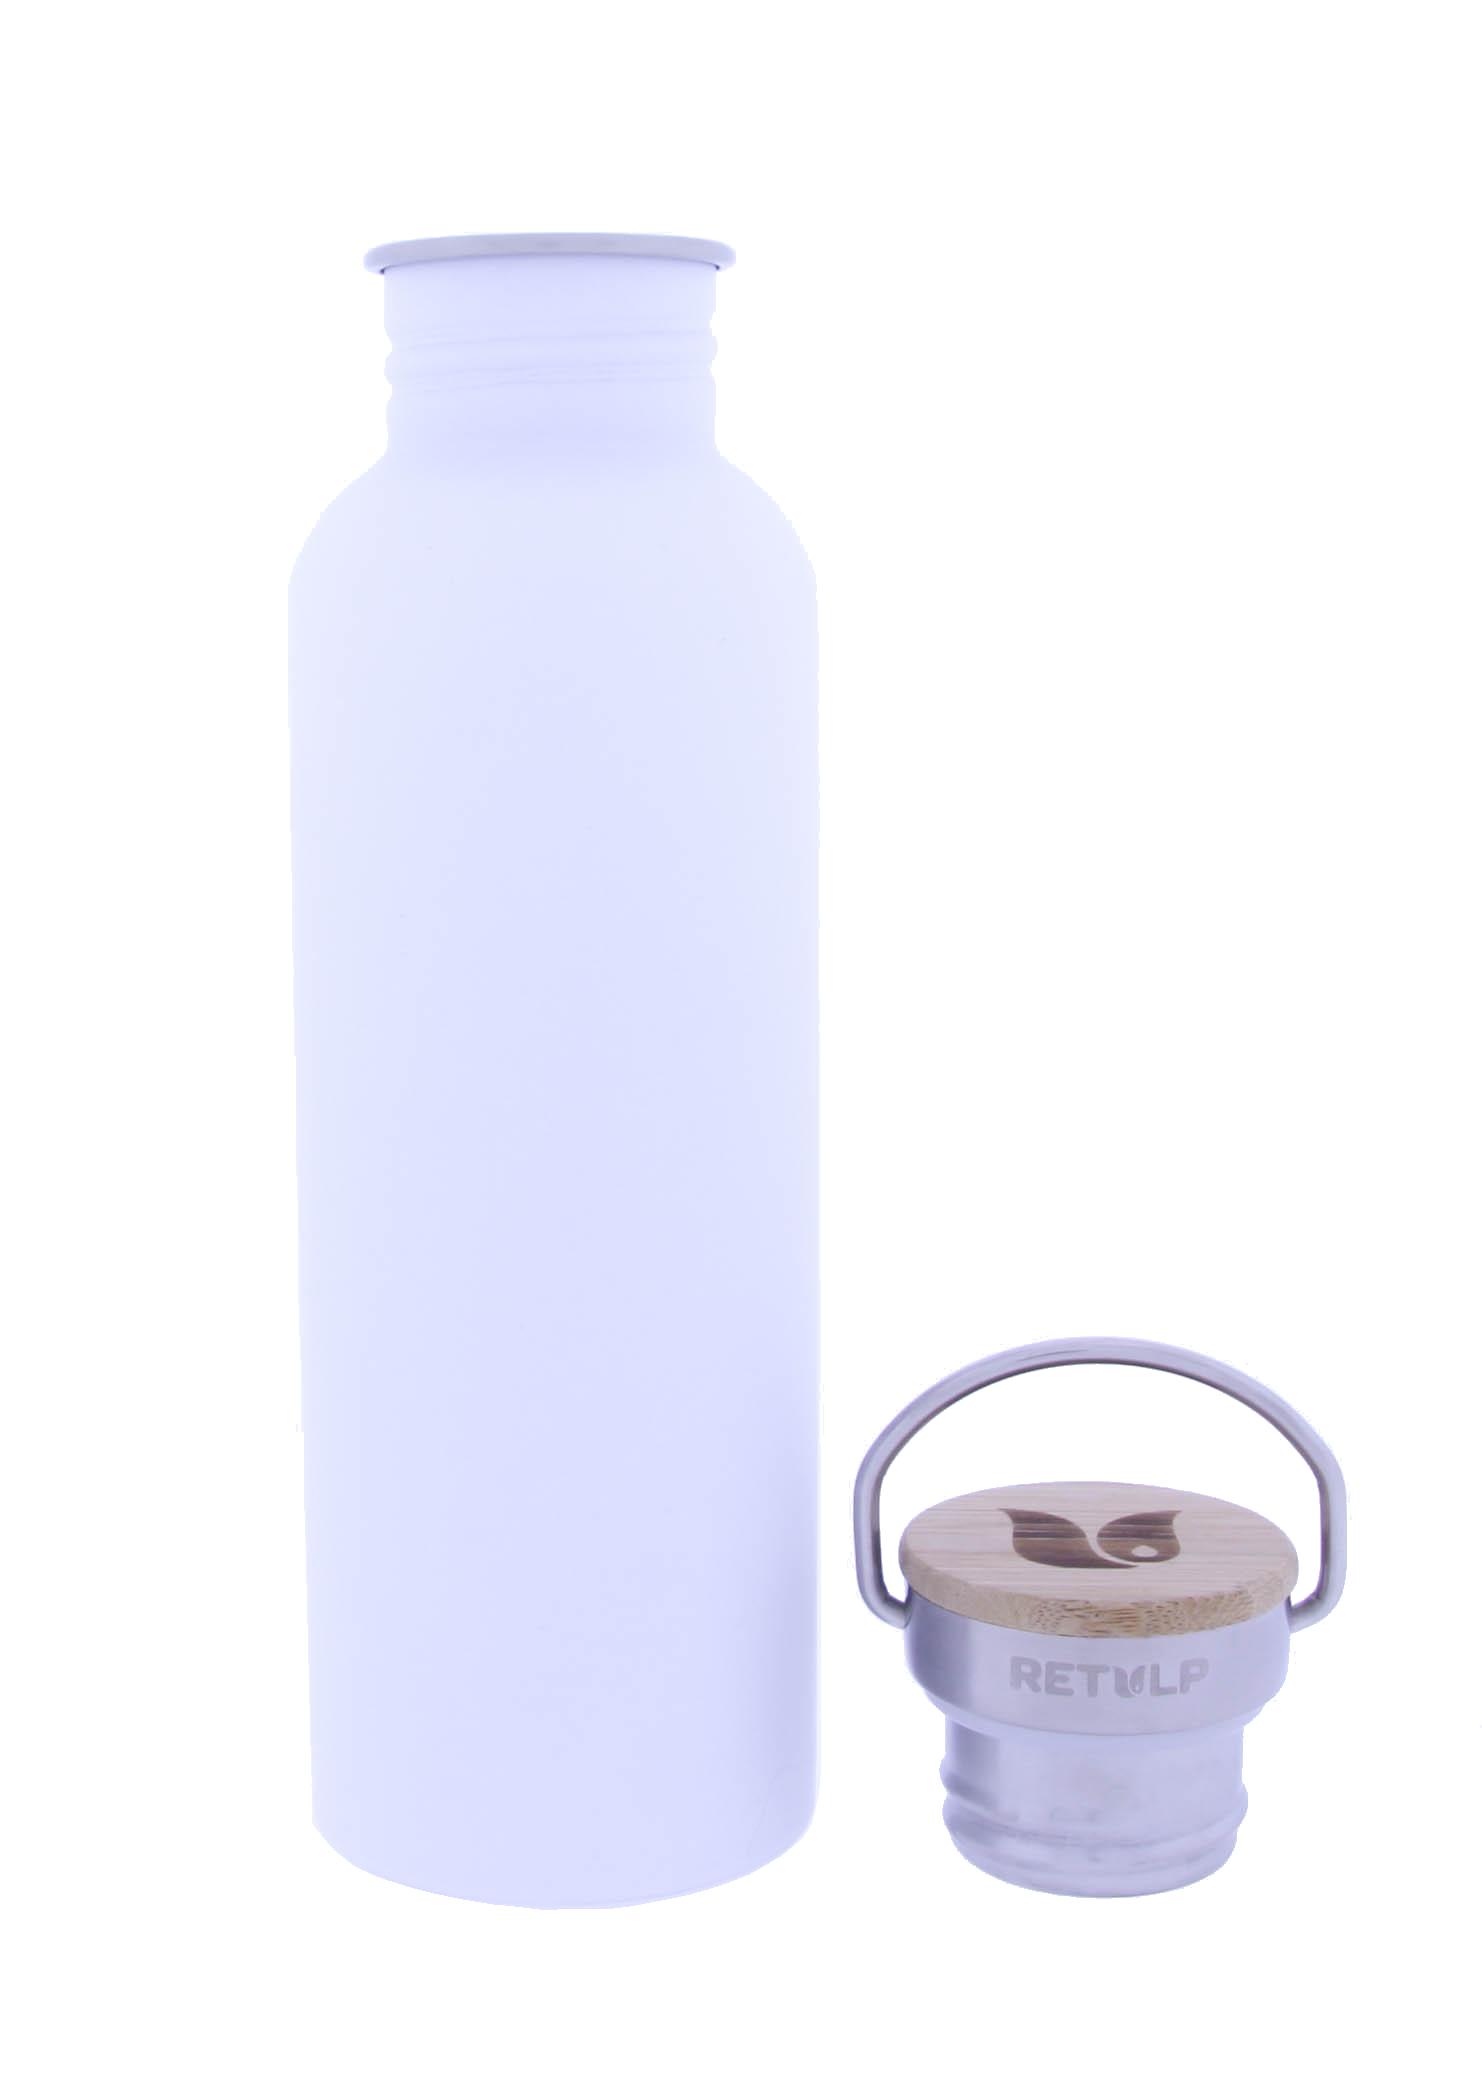 Retulp Urban Chalk White met Bamboo dop 750ml